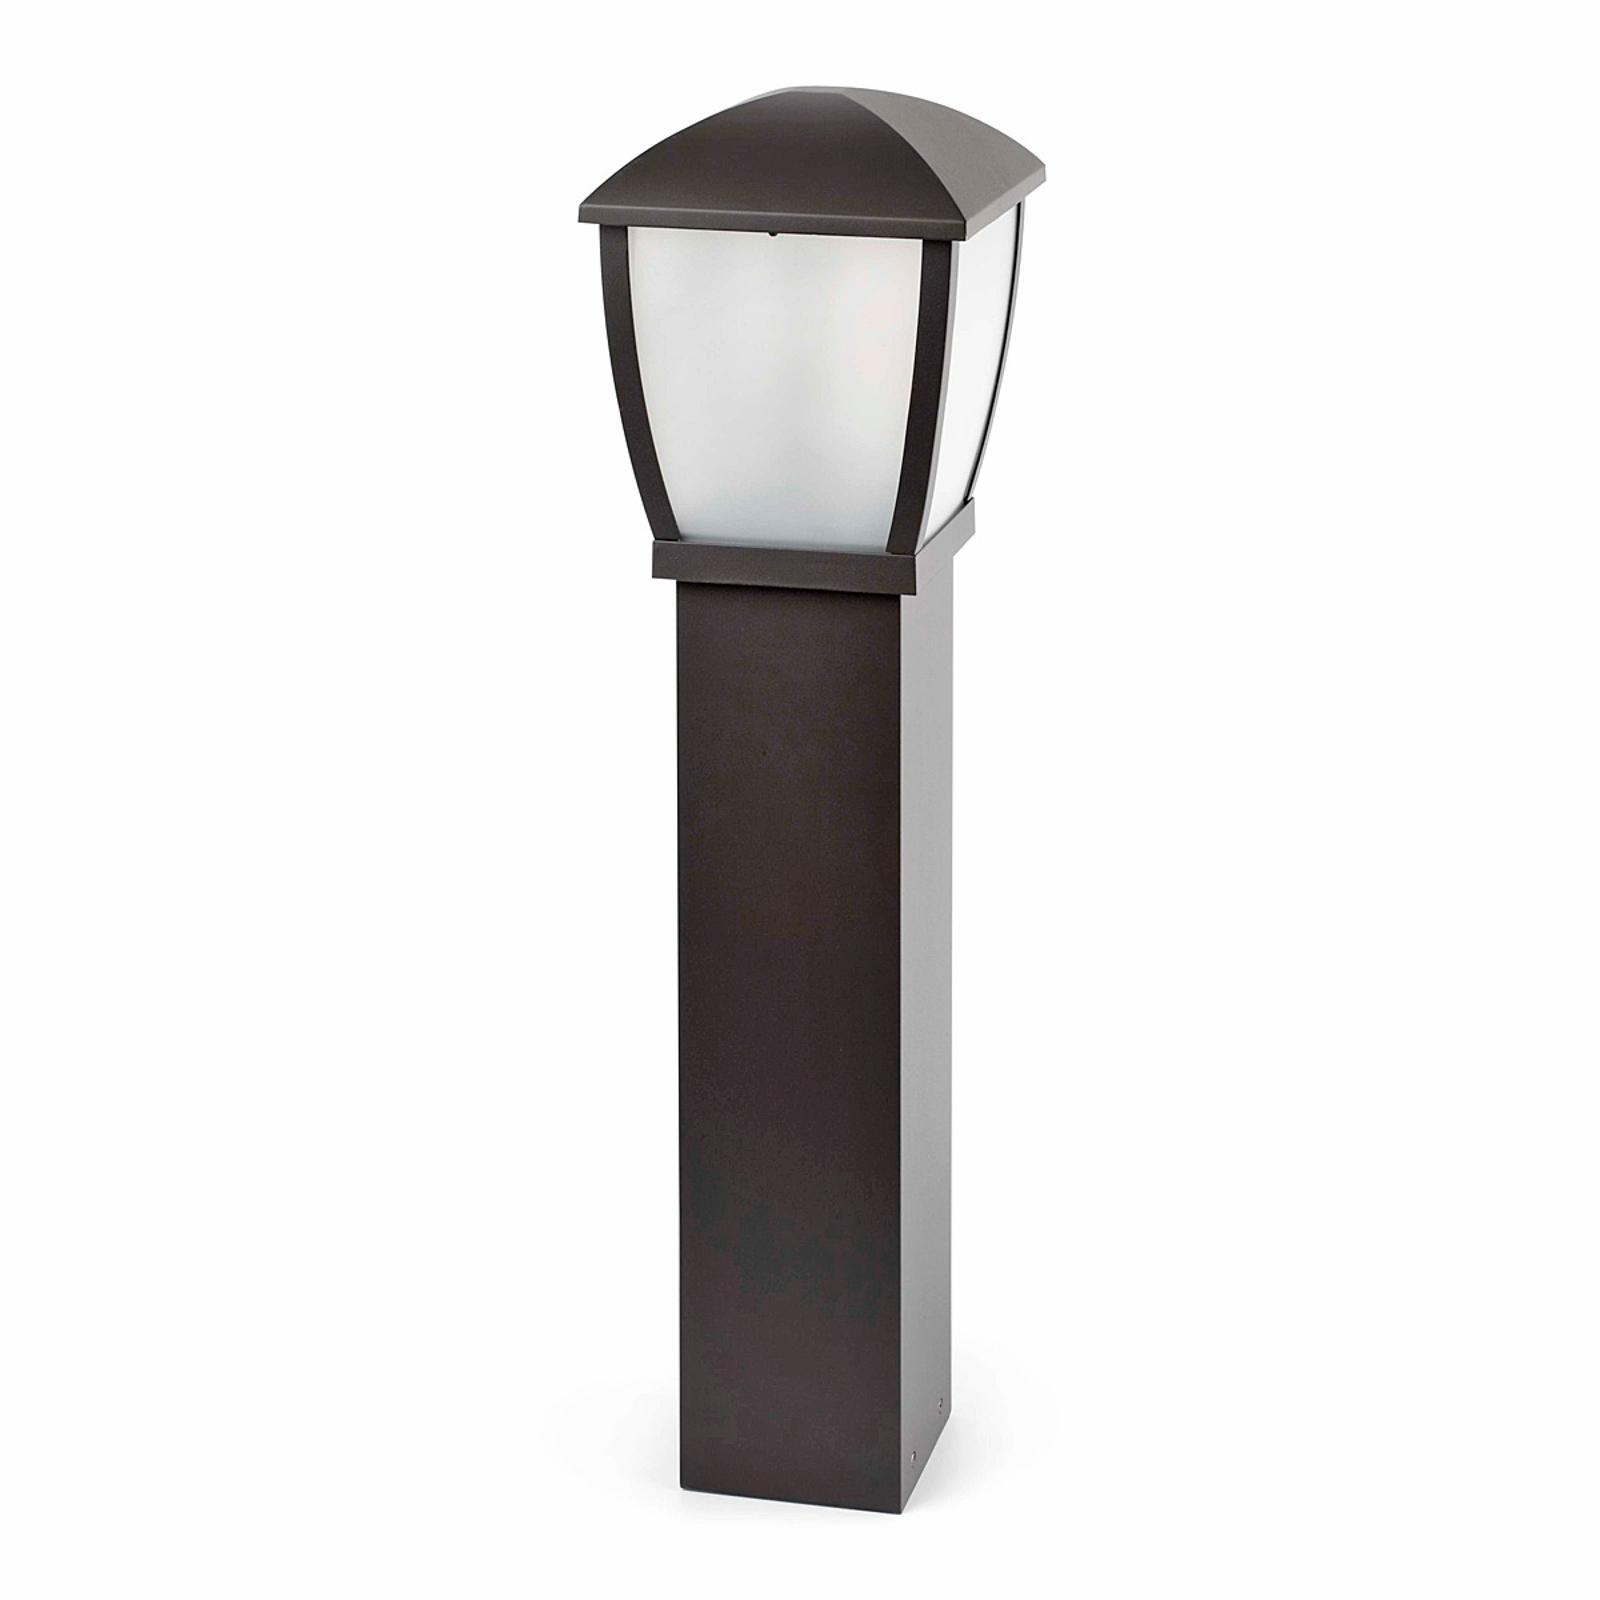 Wilma Aluminium Path Lamp_3505302_1